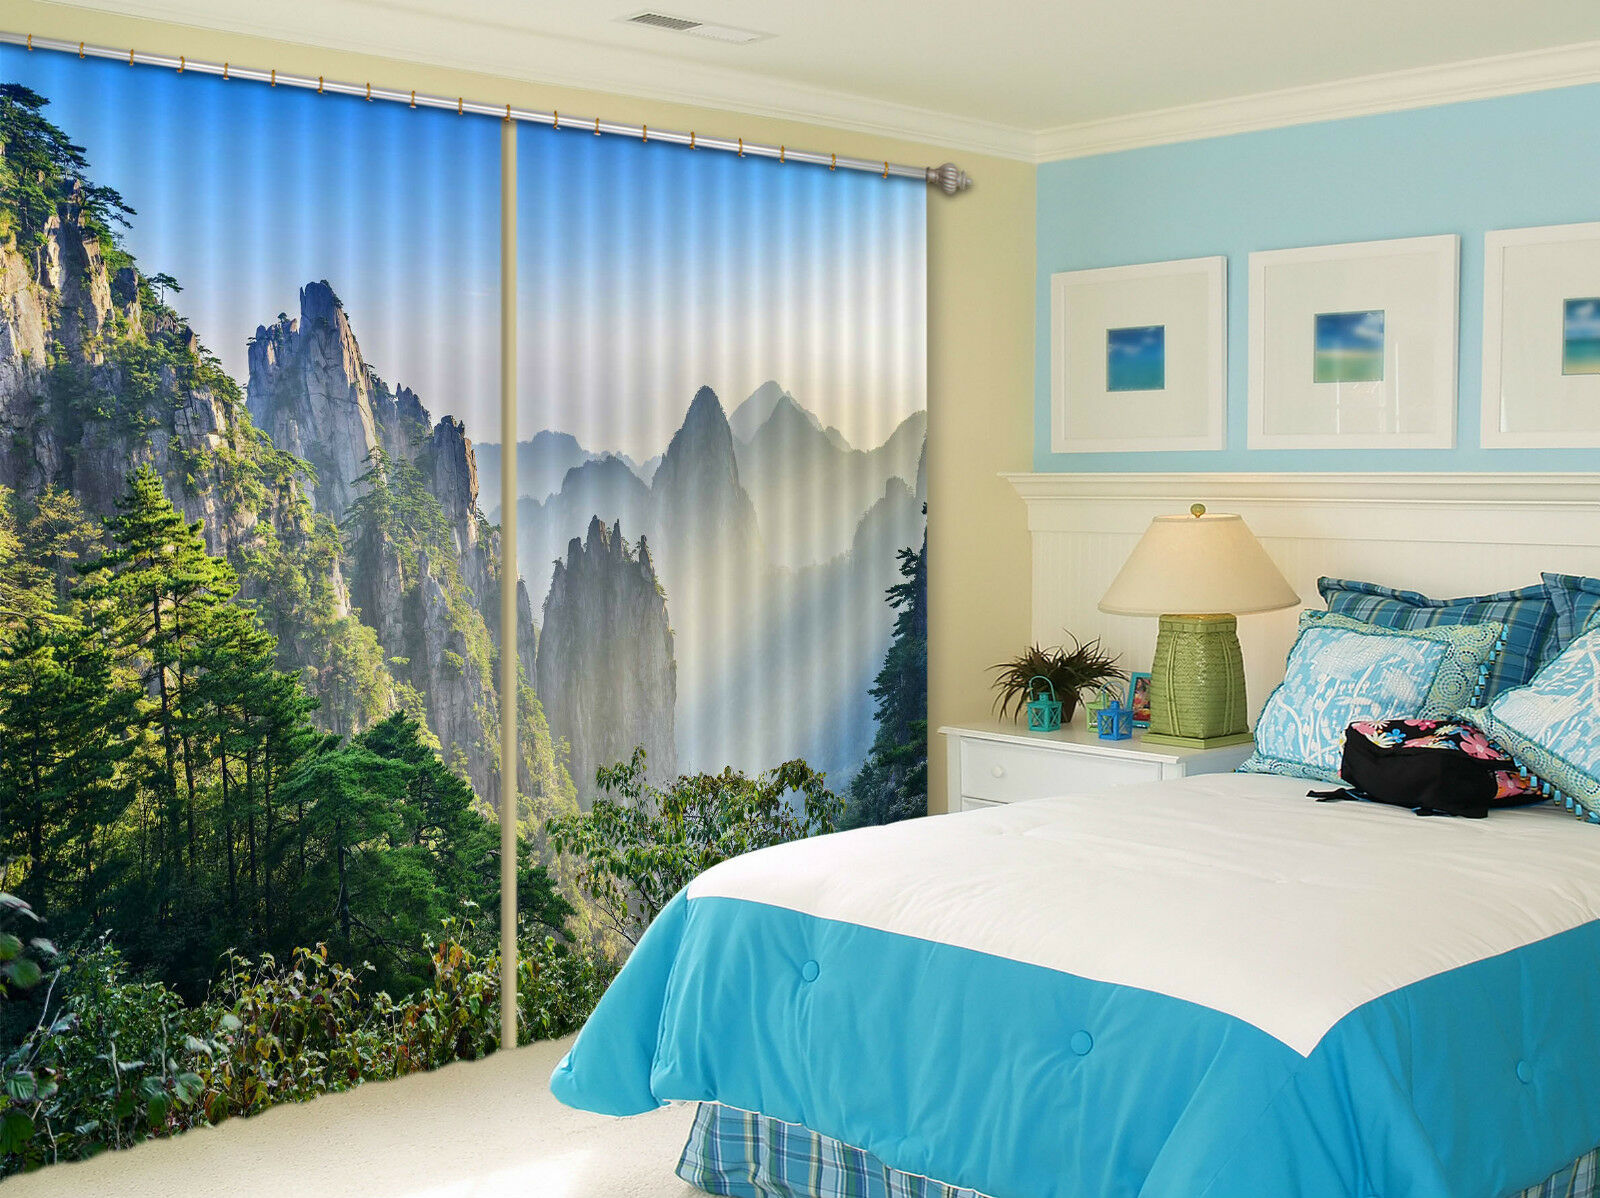 3d montagna vista 325 blocco foto sipario pressione sipario tende tessuto finestra de